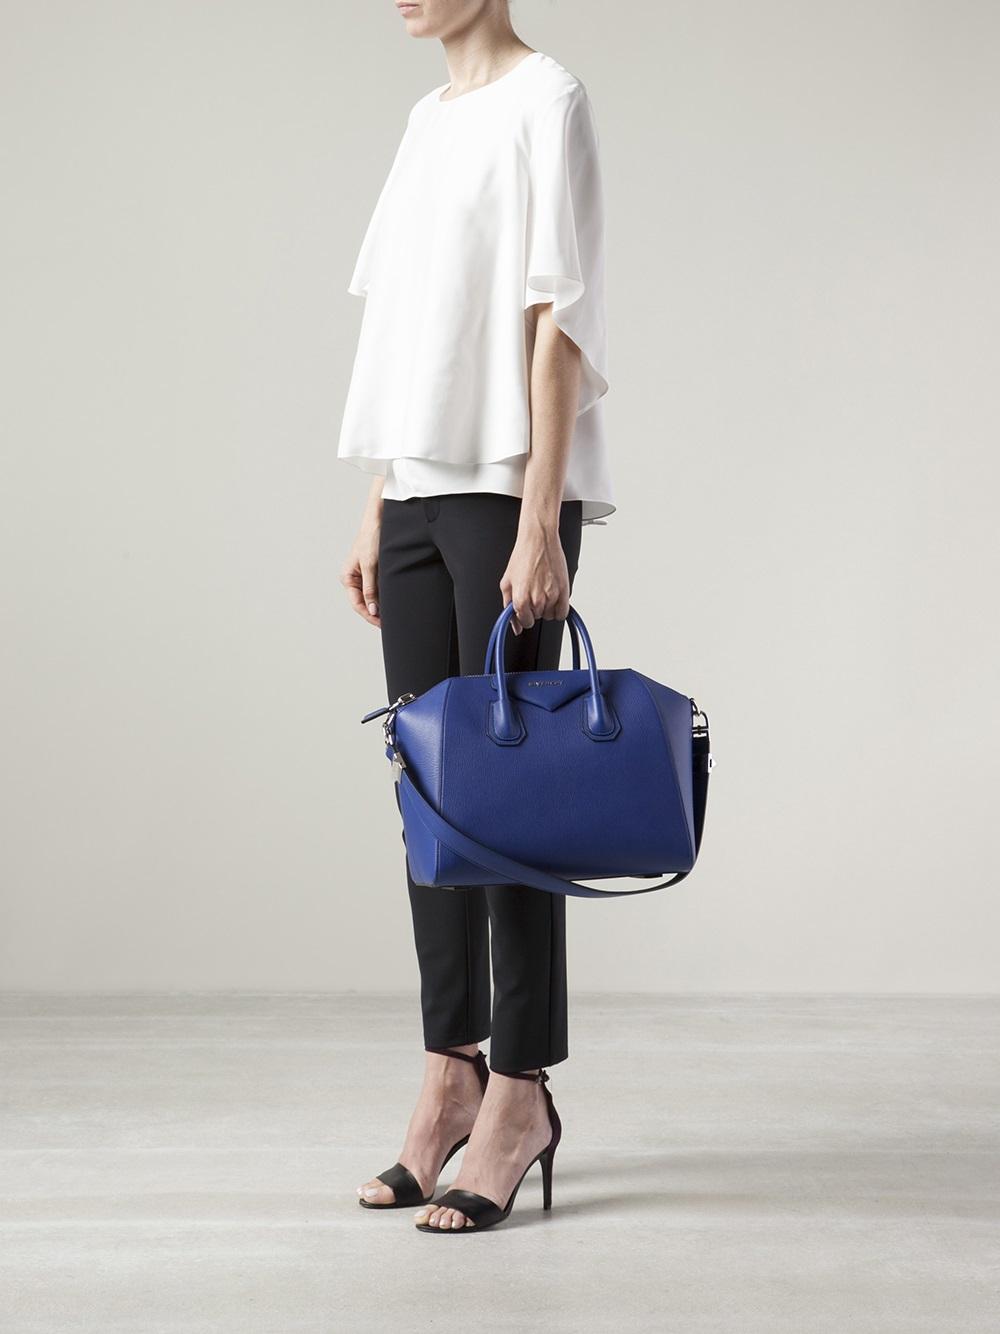 givenchy antigona medium bag in blue lyst. Black Bedroom Furniture Sets. Home Design Ideas